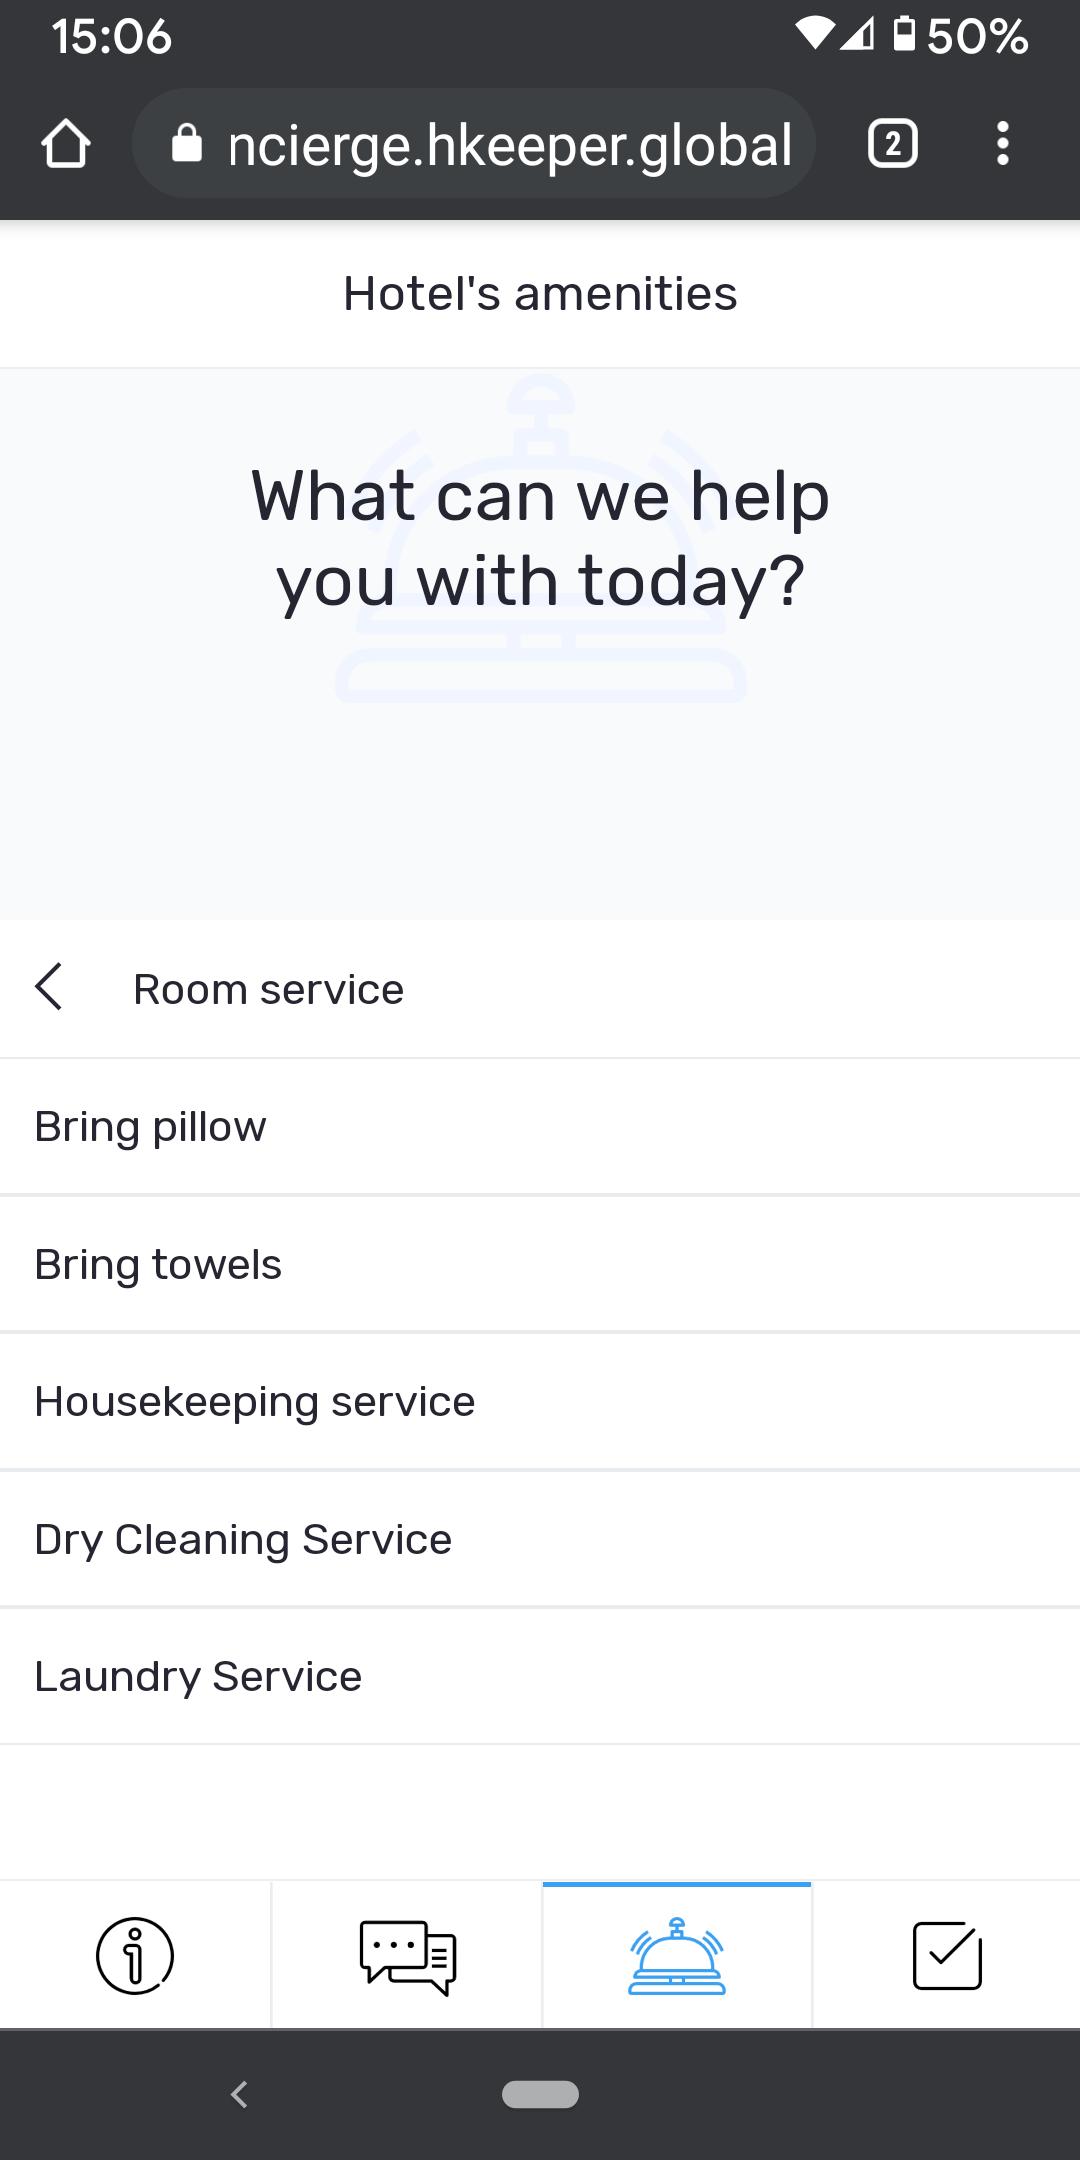 HKeeper Virtual Concierge Room Service